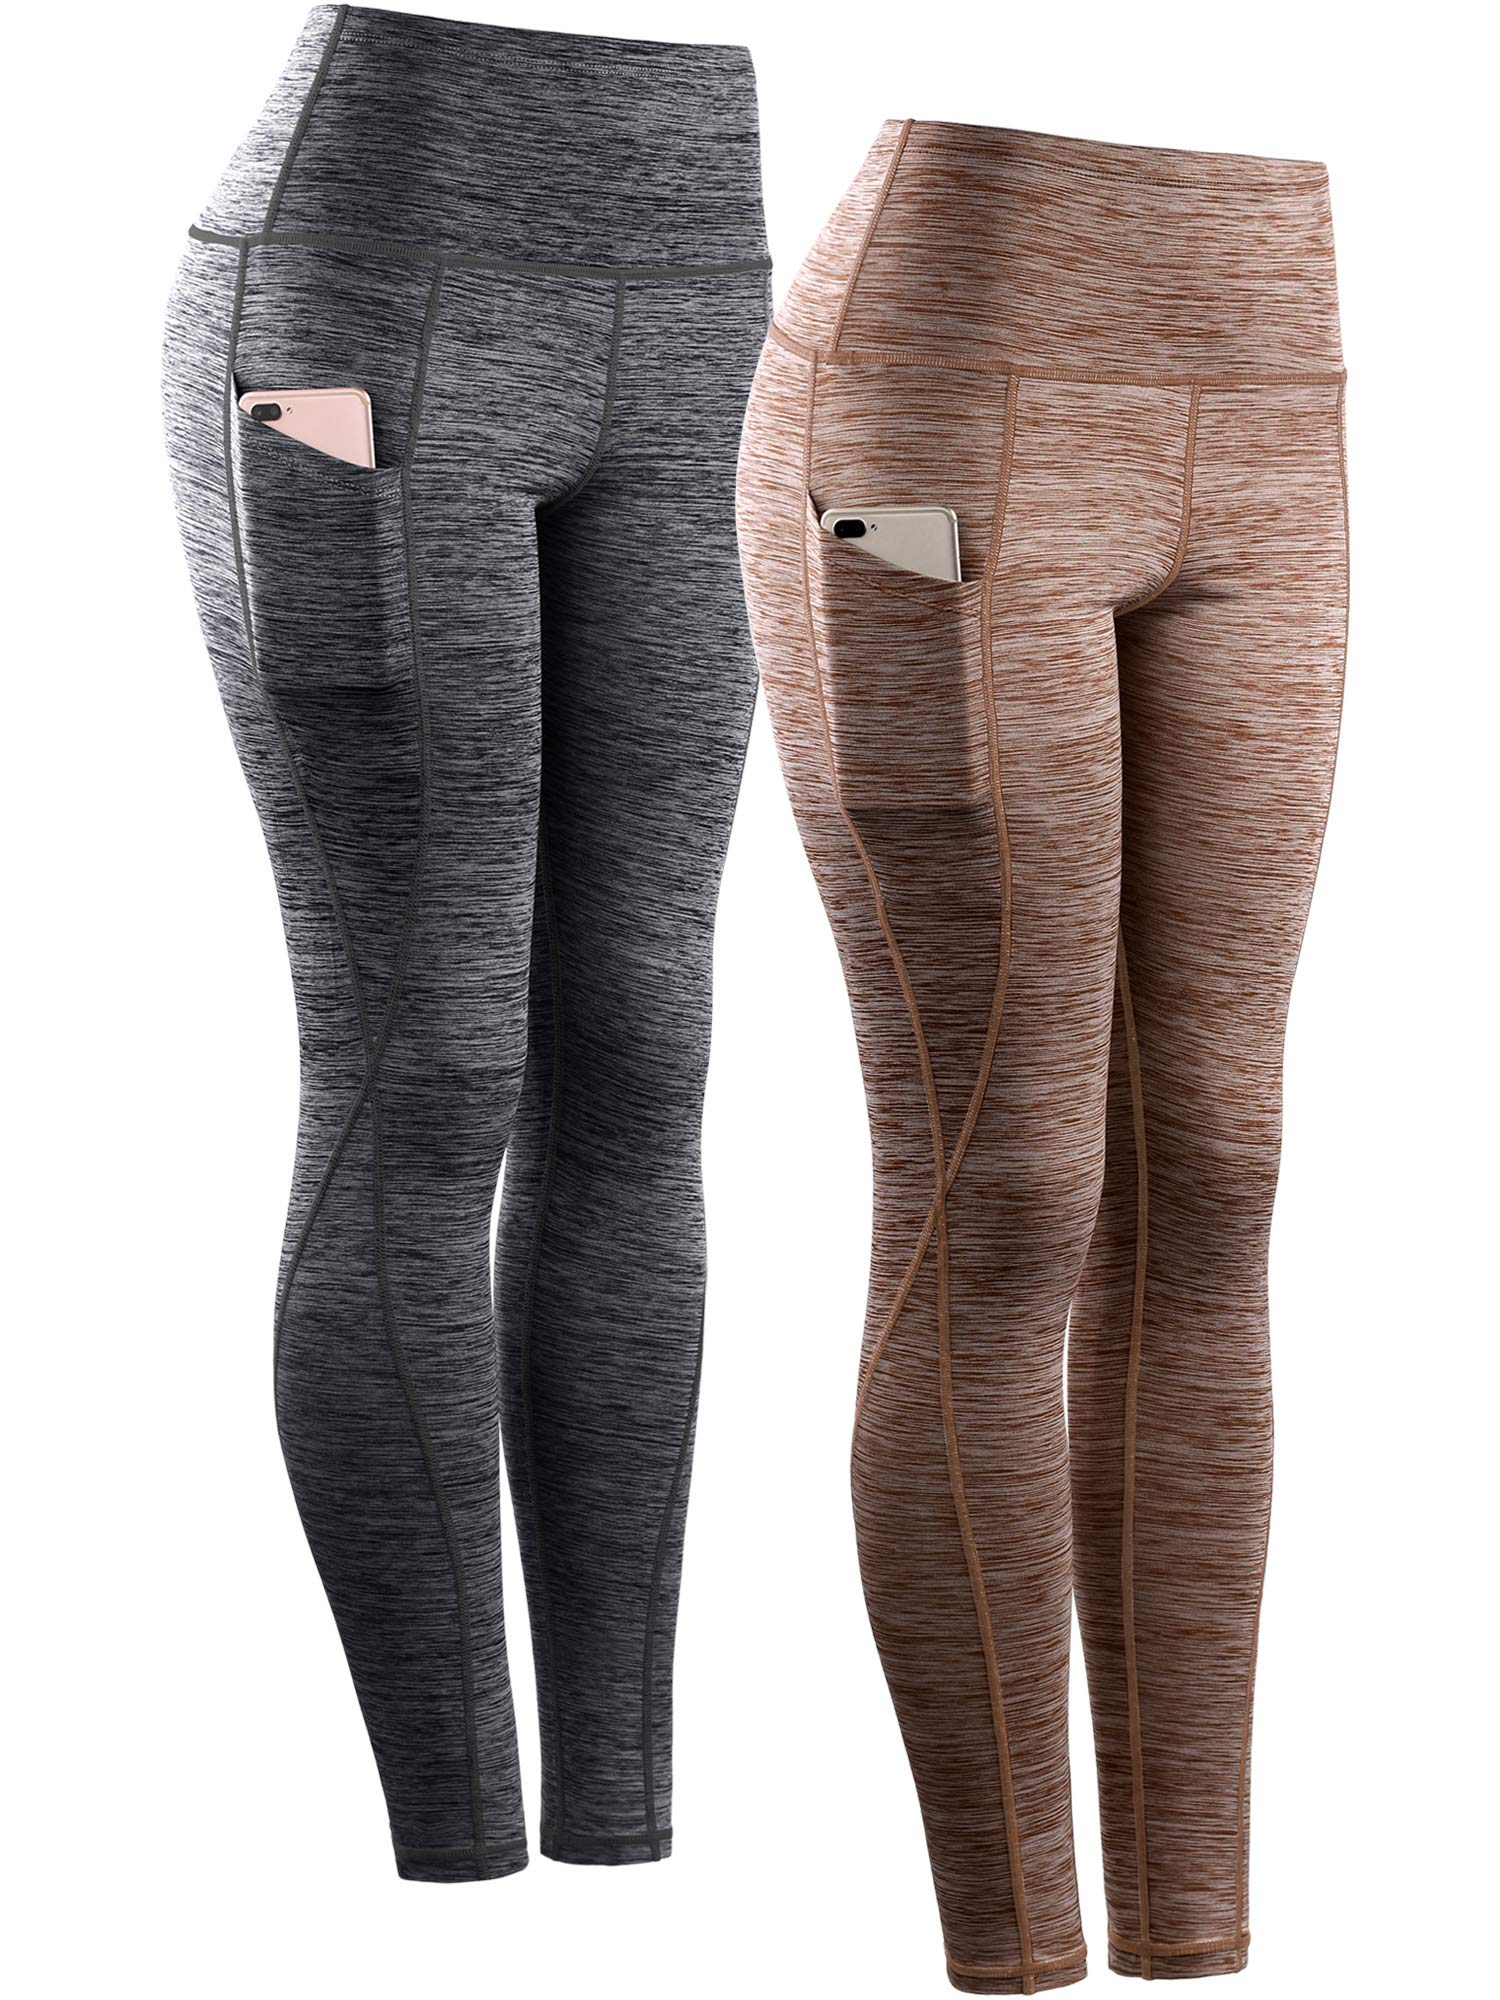 Neleus Tummy Control High Waist Workout Running Leggings for Women,9033,Yoga Pant 2 Pack,Black,Brown,S,EU M